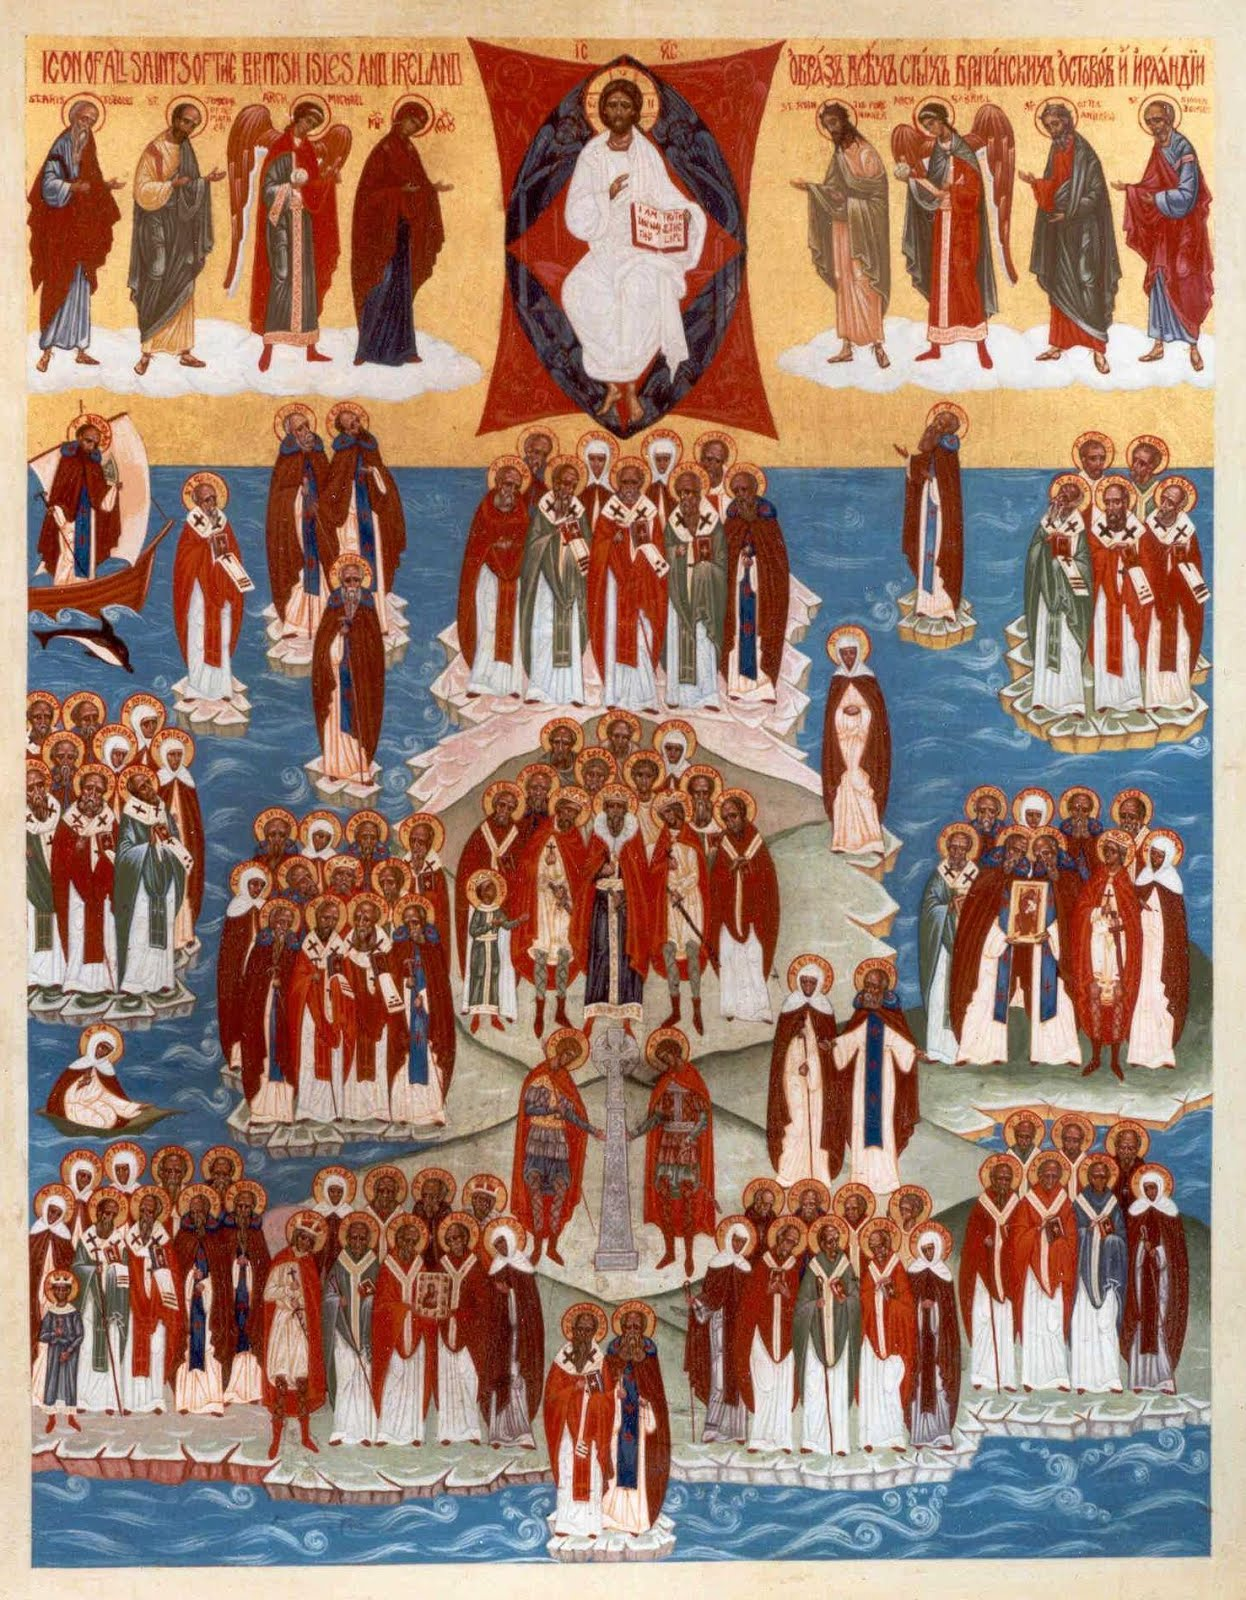 Saints of Britain and Ireland